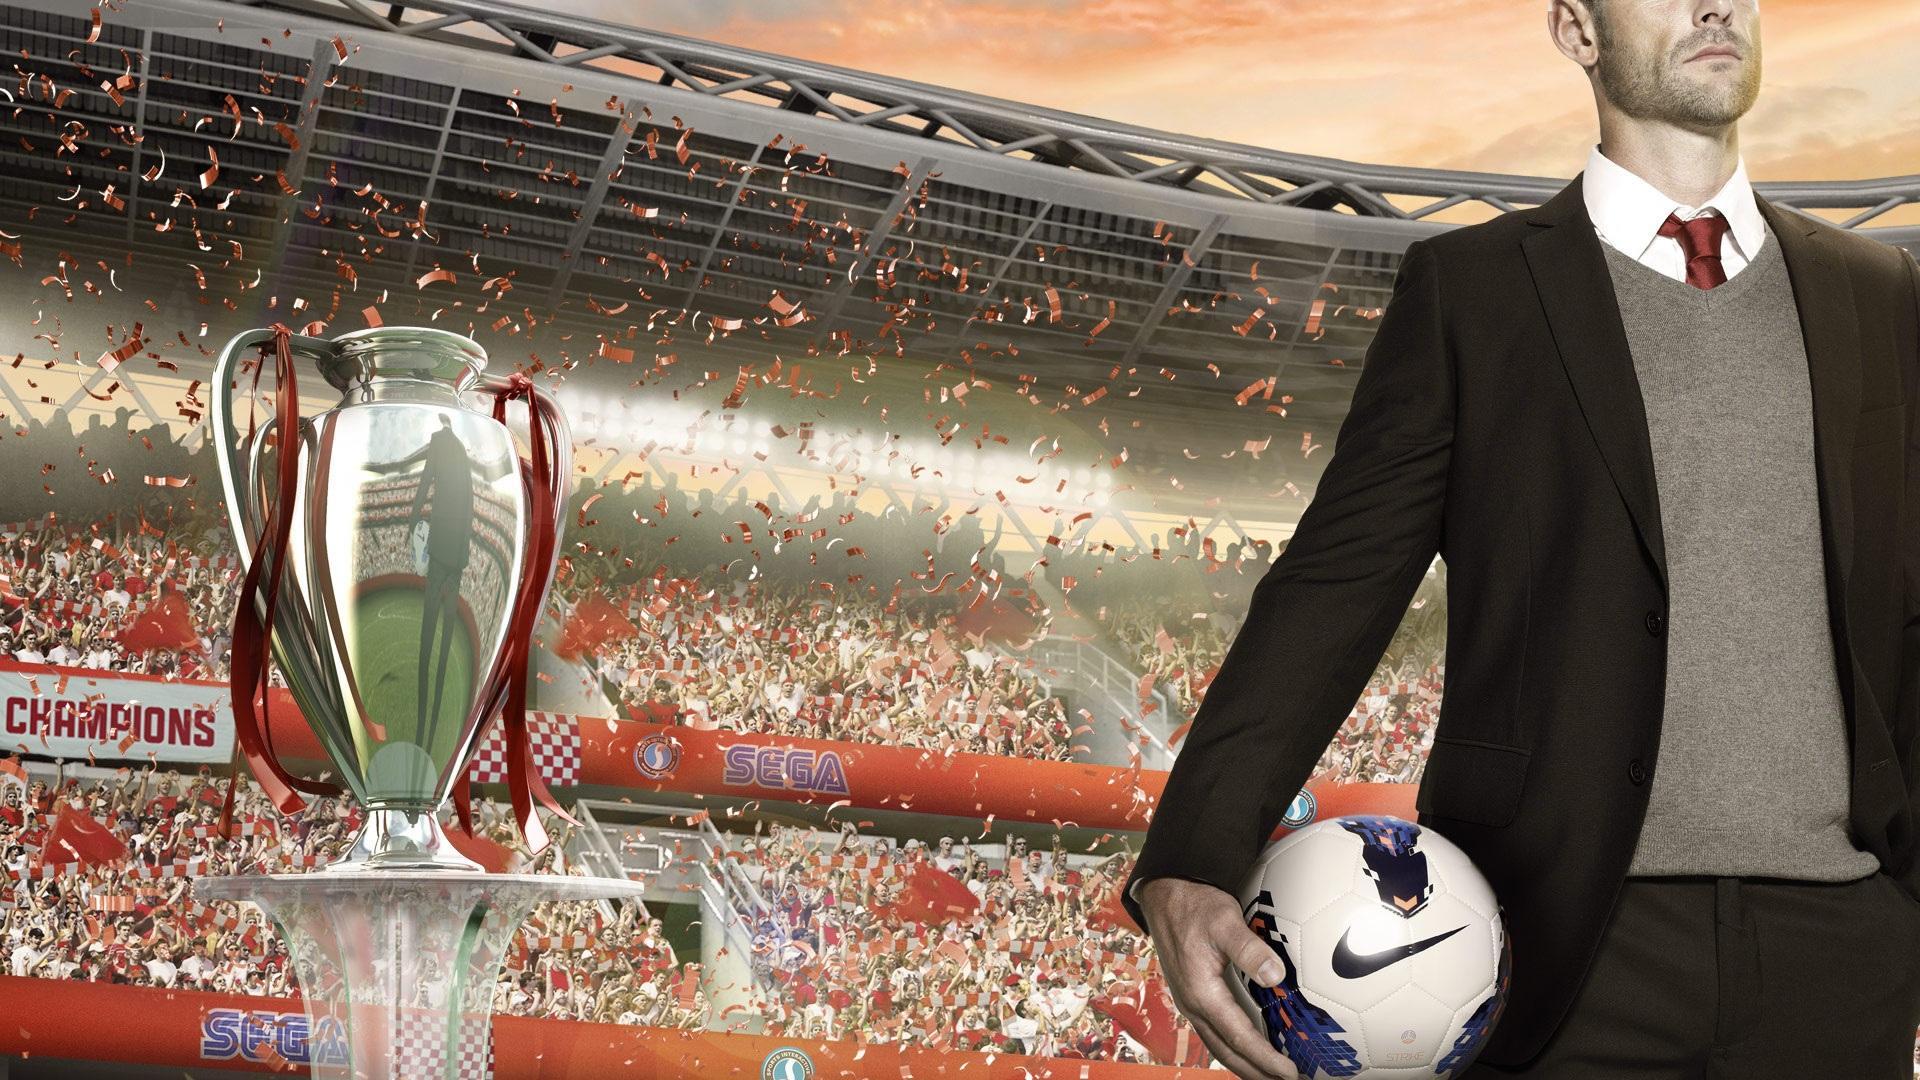 football manager 2012 fanart background